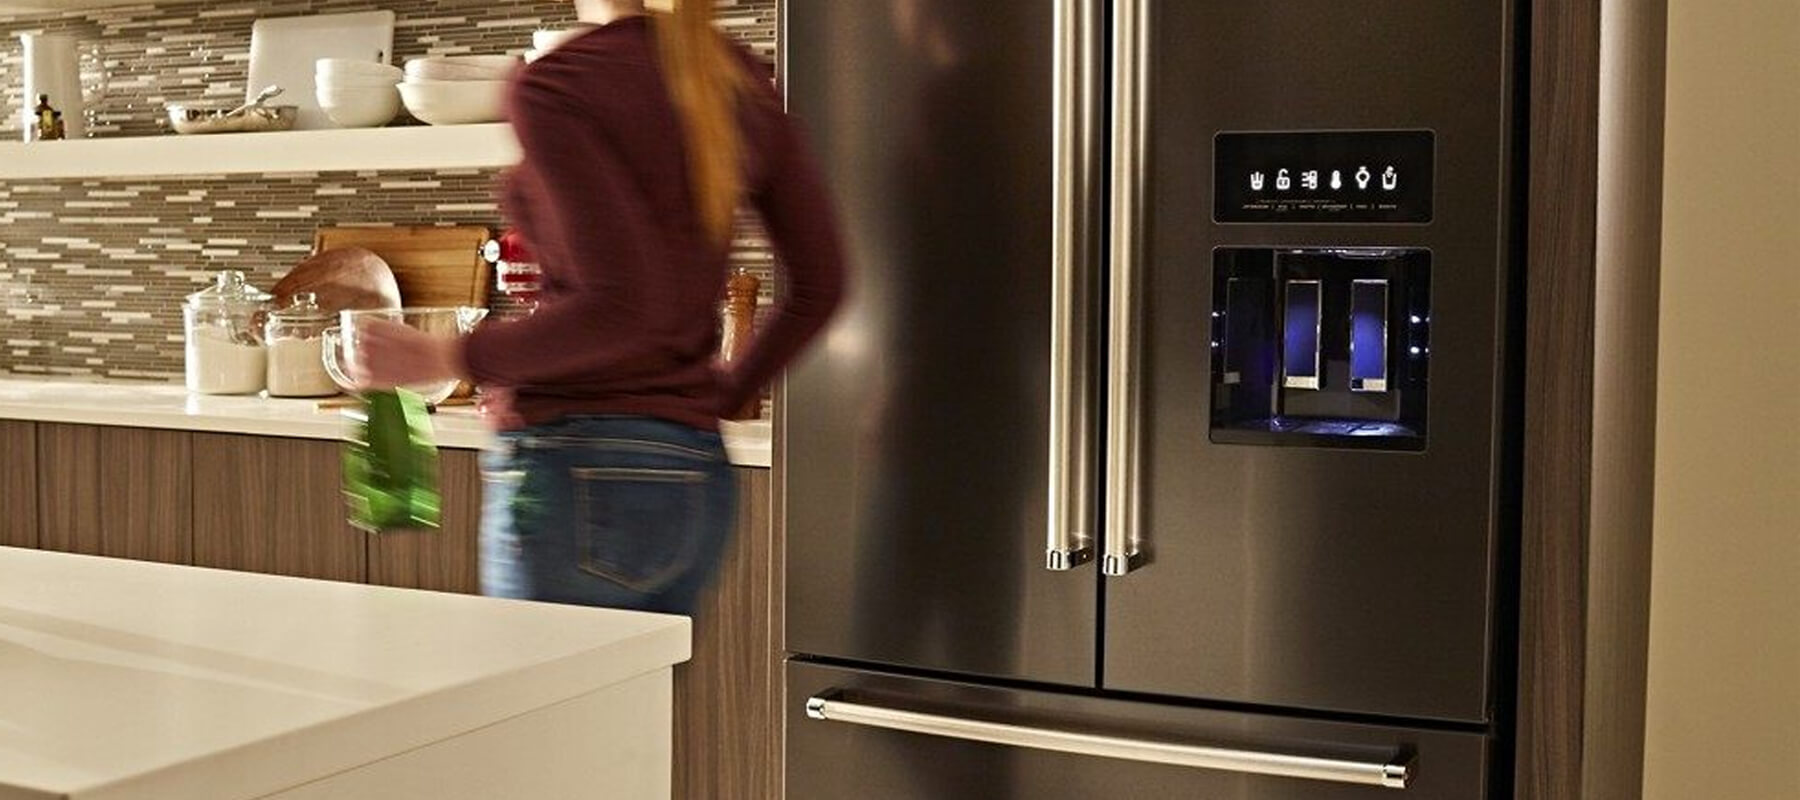 Kitchenaid Authorized Repair Service | Built-in Refrigerator Repair